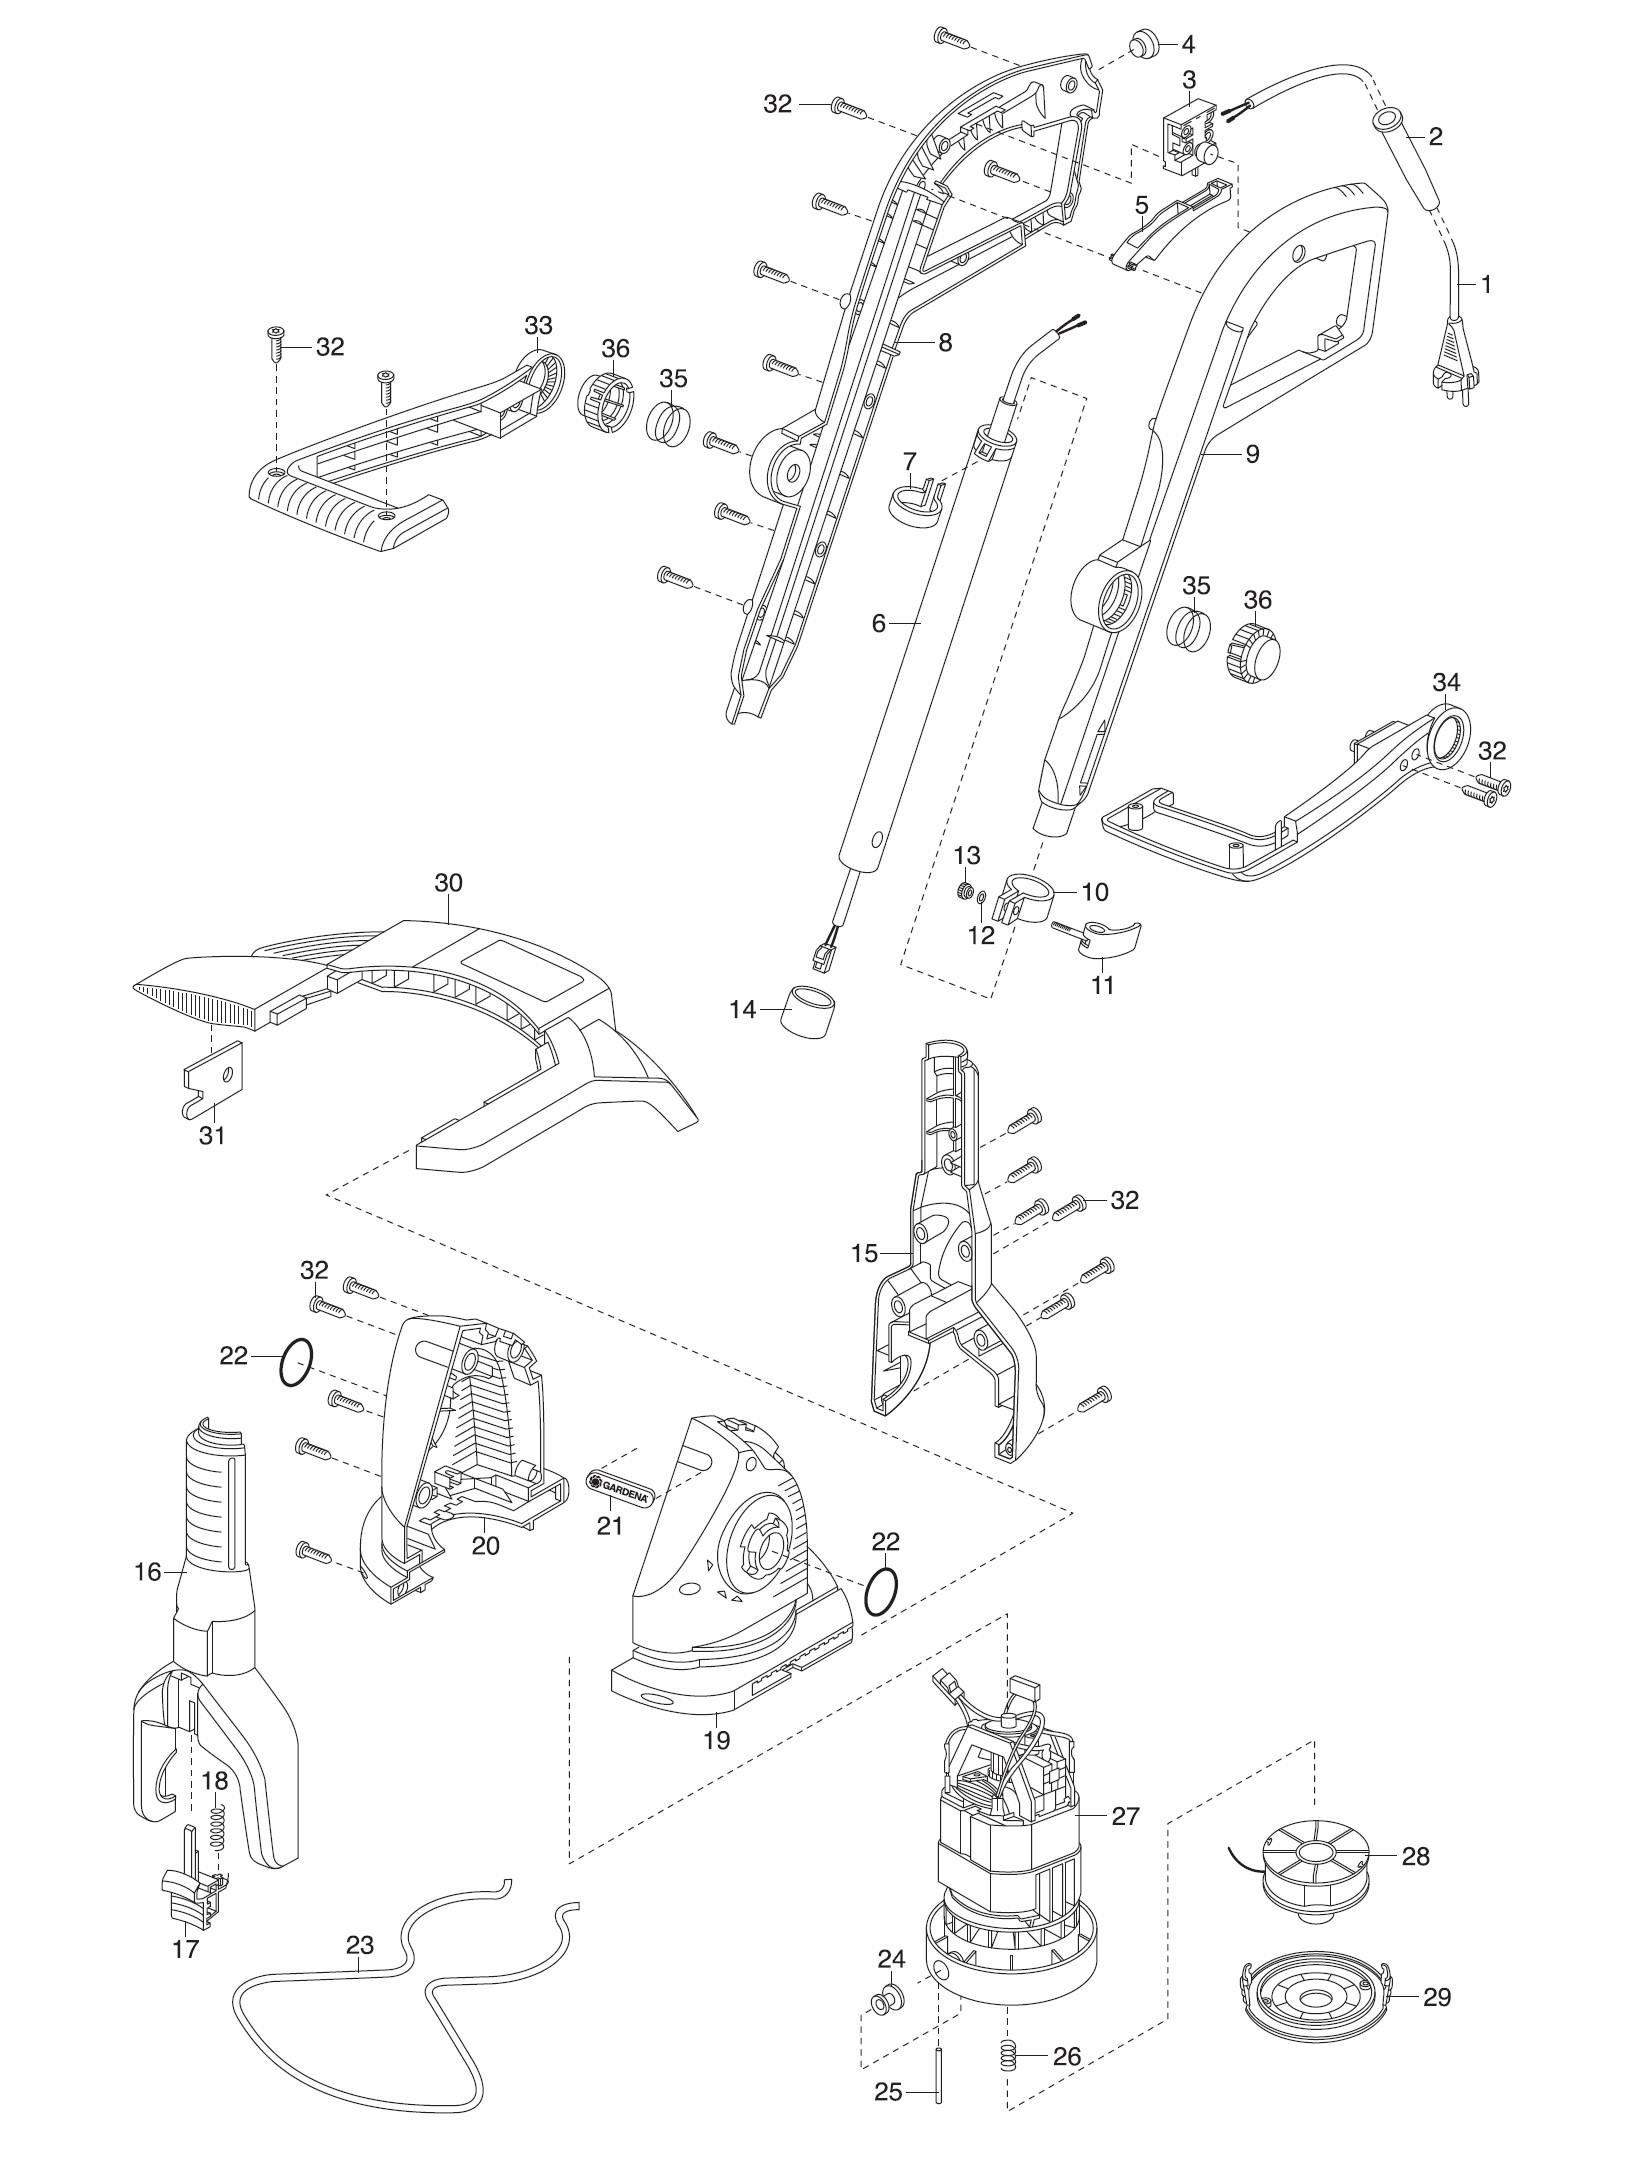 ersatzteile gardena turbotrimmer easycut 400 8846. Black Bedroom Furniture Sets. Home Design Ideas